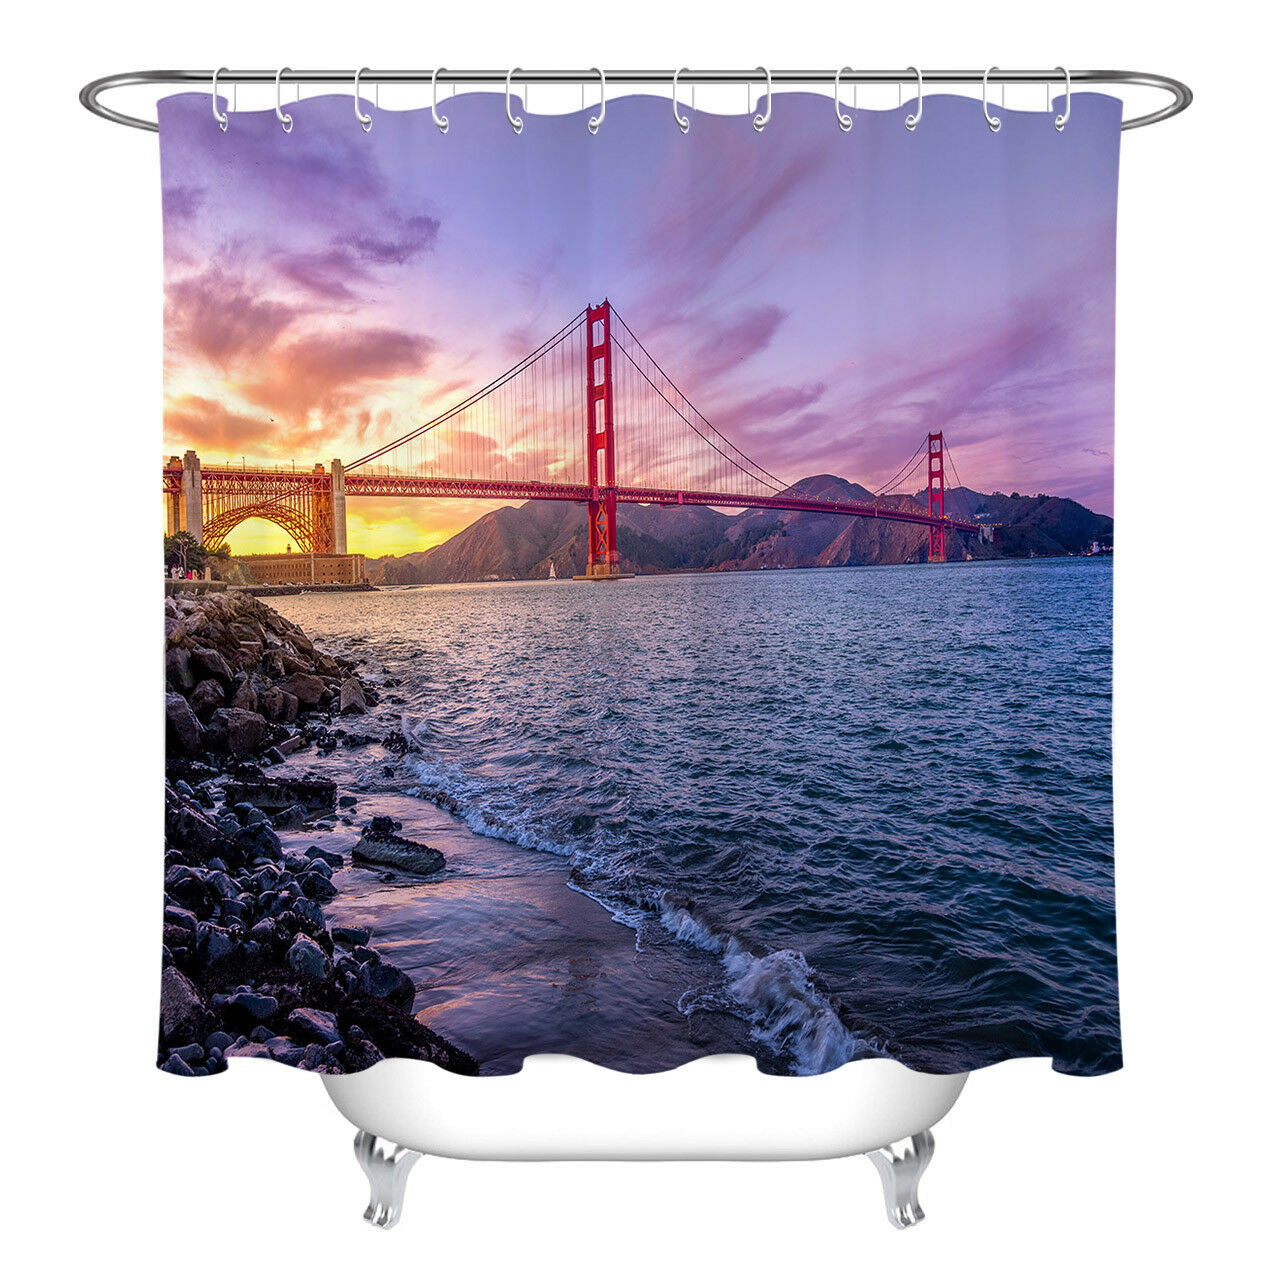 Golden gate bridge sunset banheiro cortina de chuveiro impermeável forro tecido